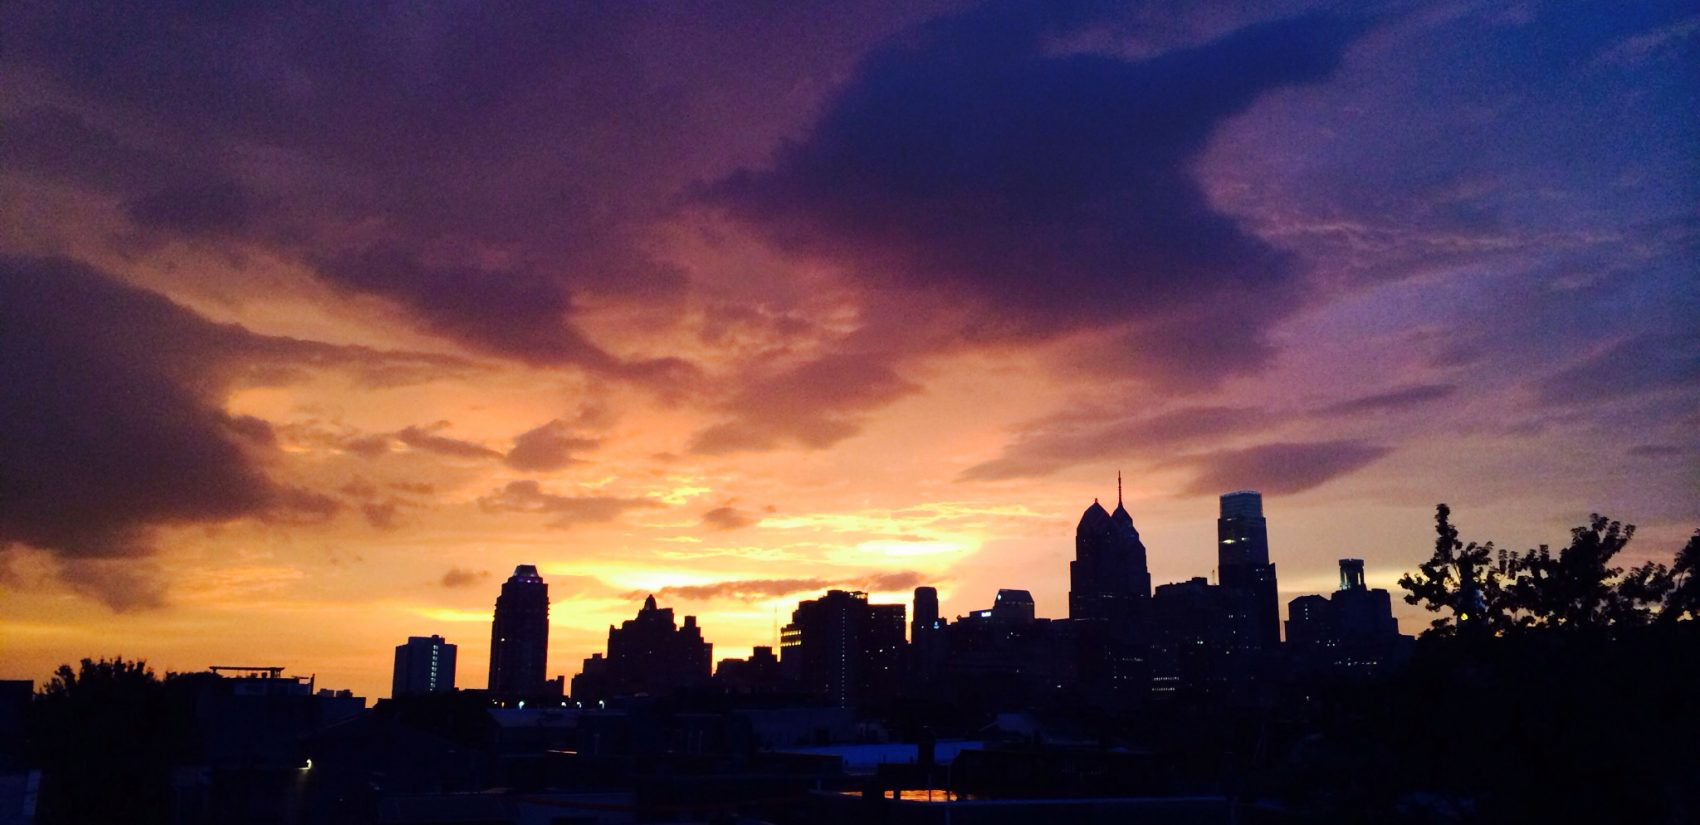 Stormy Philadelphia skyline at sunset